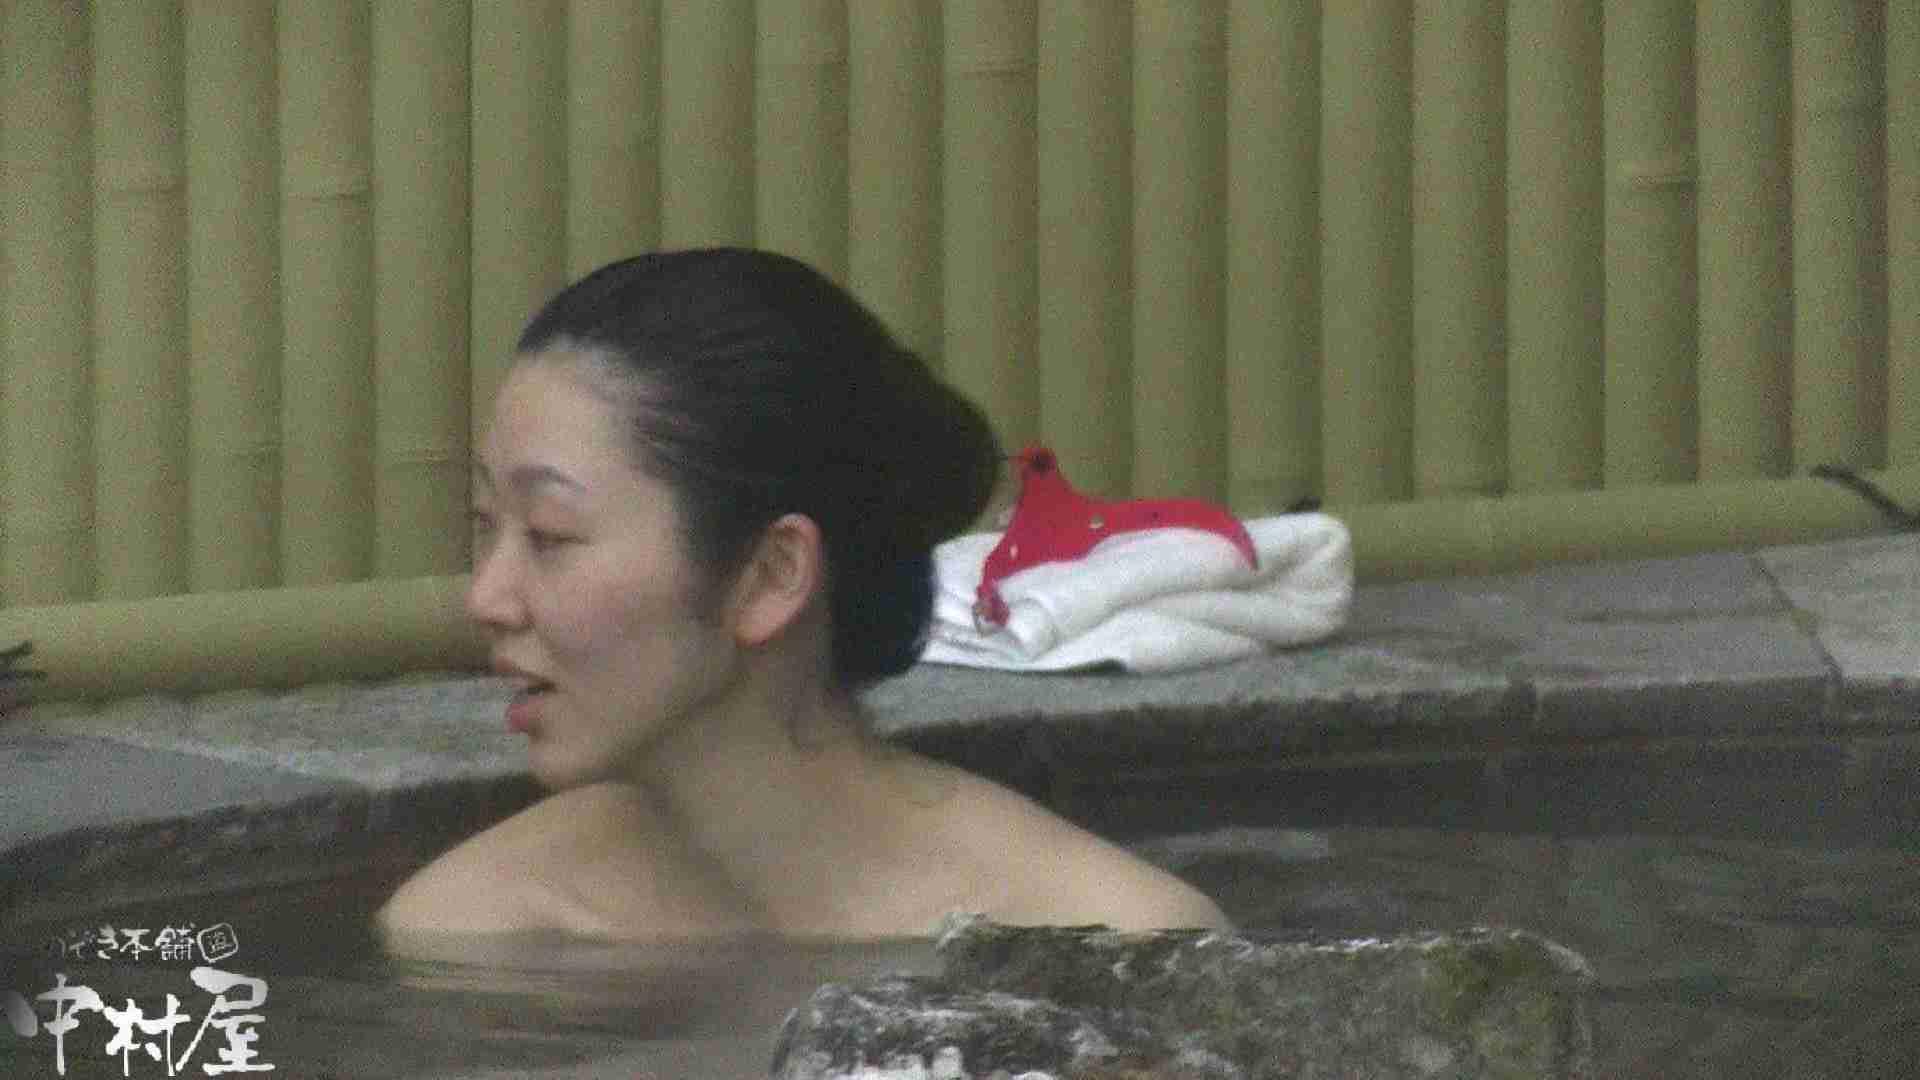 Aquaな露天風呂Vol.917 OLセックス  102画像 72